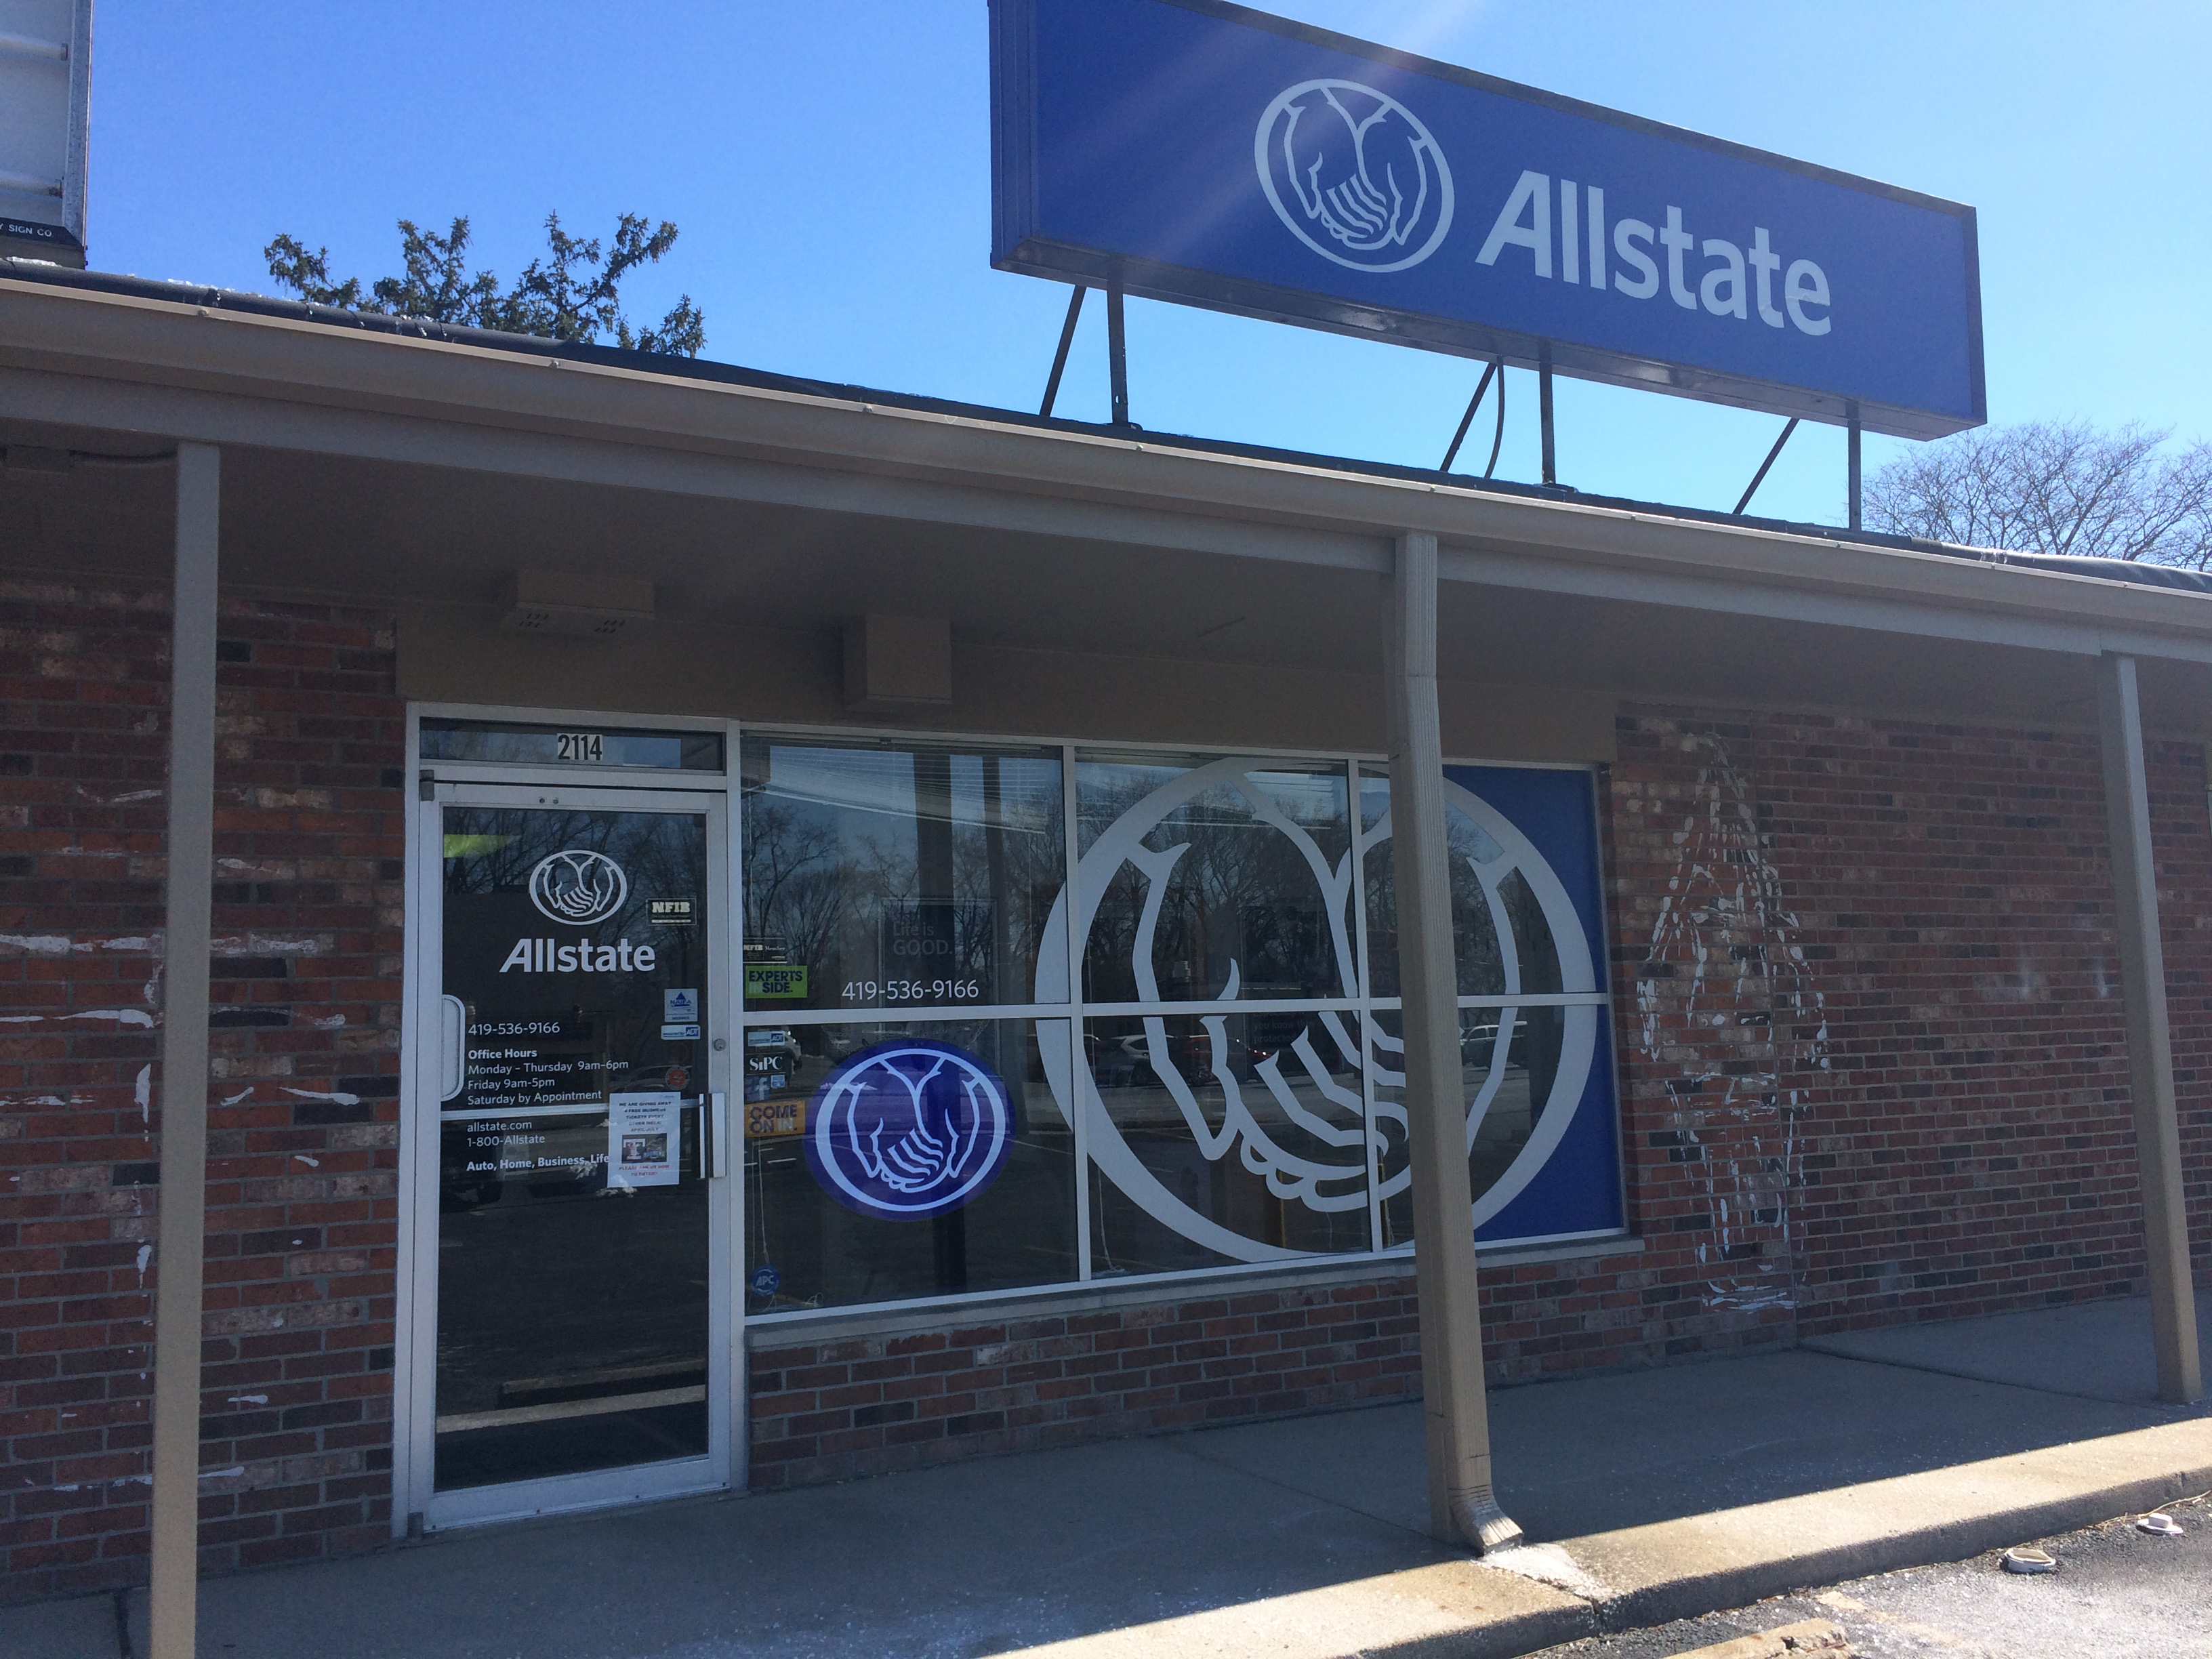 Allstate Flood Sign In >> Allstate Insurance Agent: Cody Ickes, Toledo Ohio (OH) - LocalDatabase.com